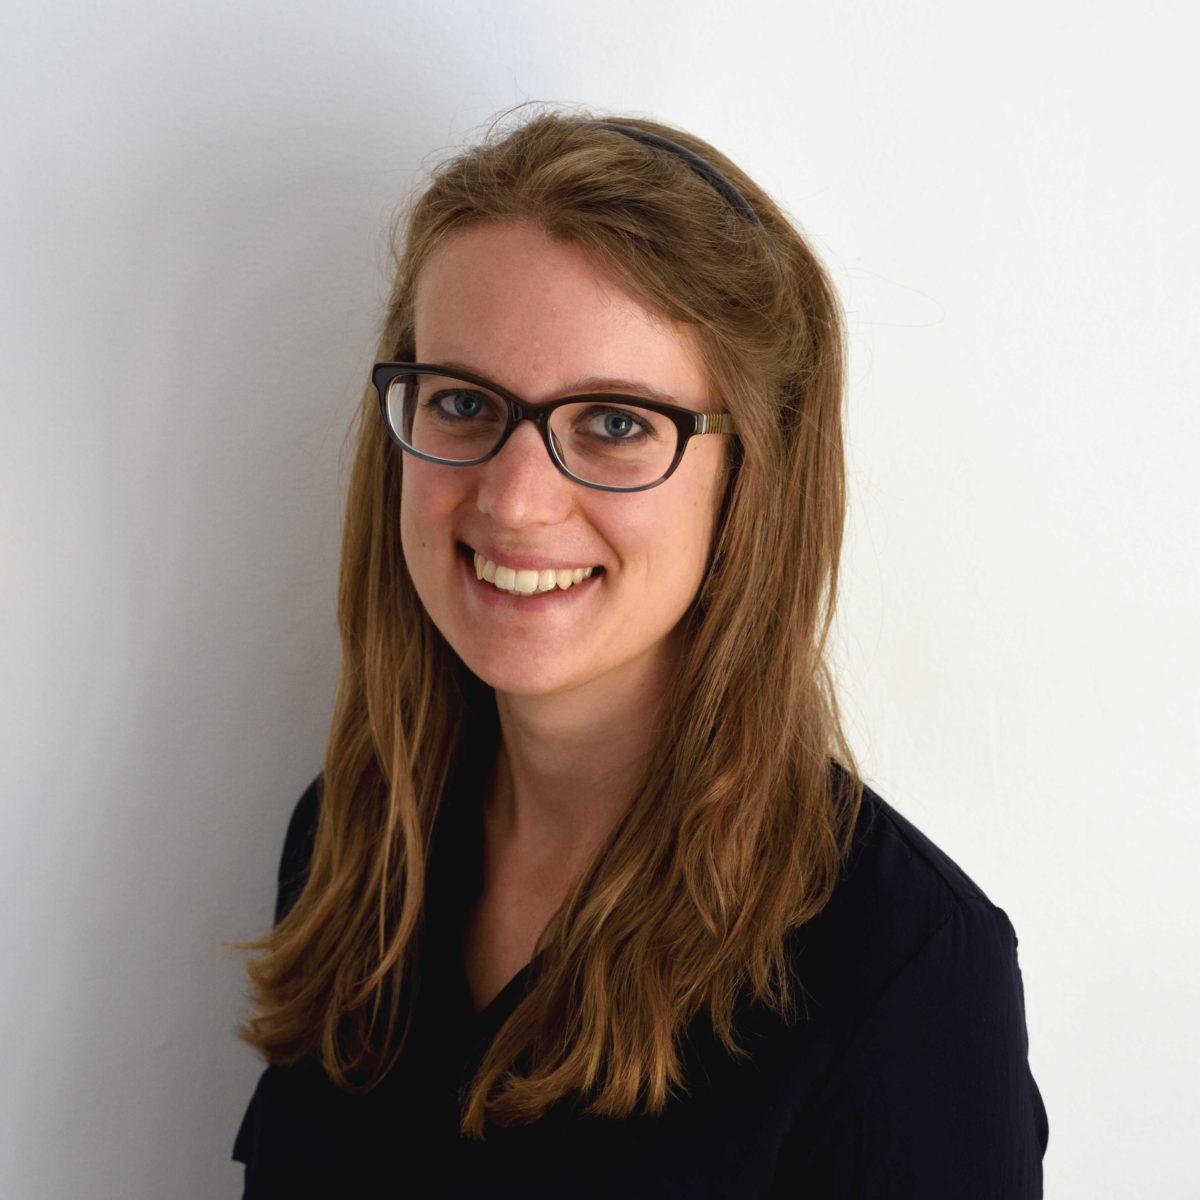 Carole Lazarus' PhD defense